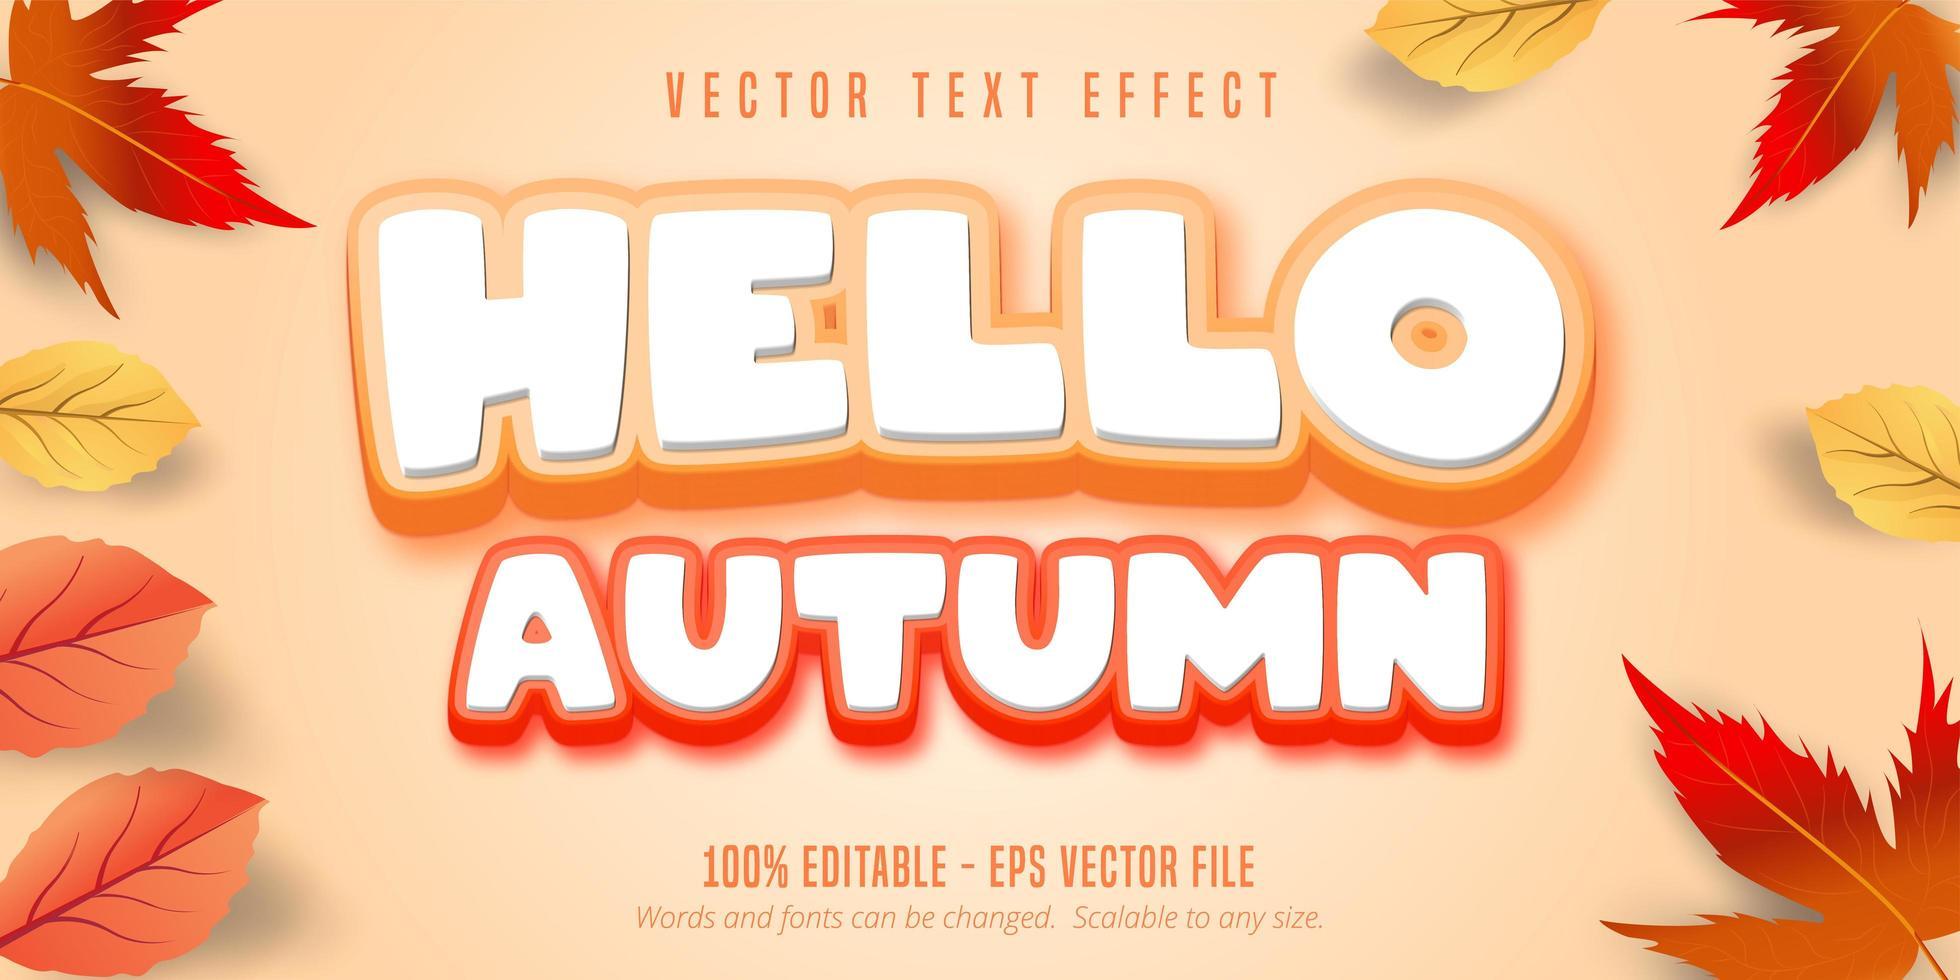 hola texto de otoño, efecto de texto de estilo otoño vector